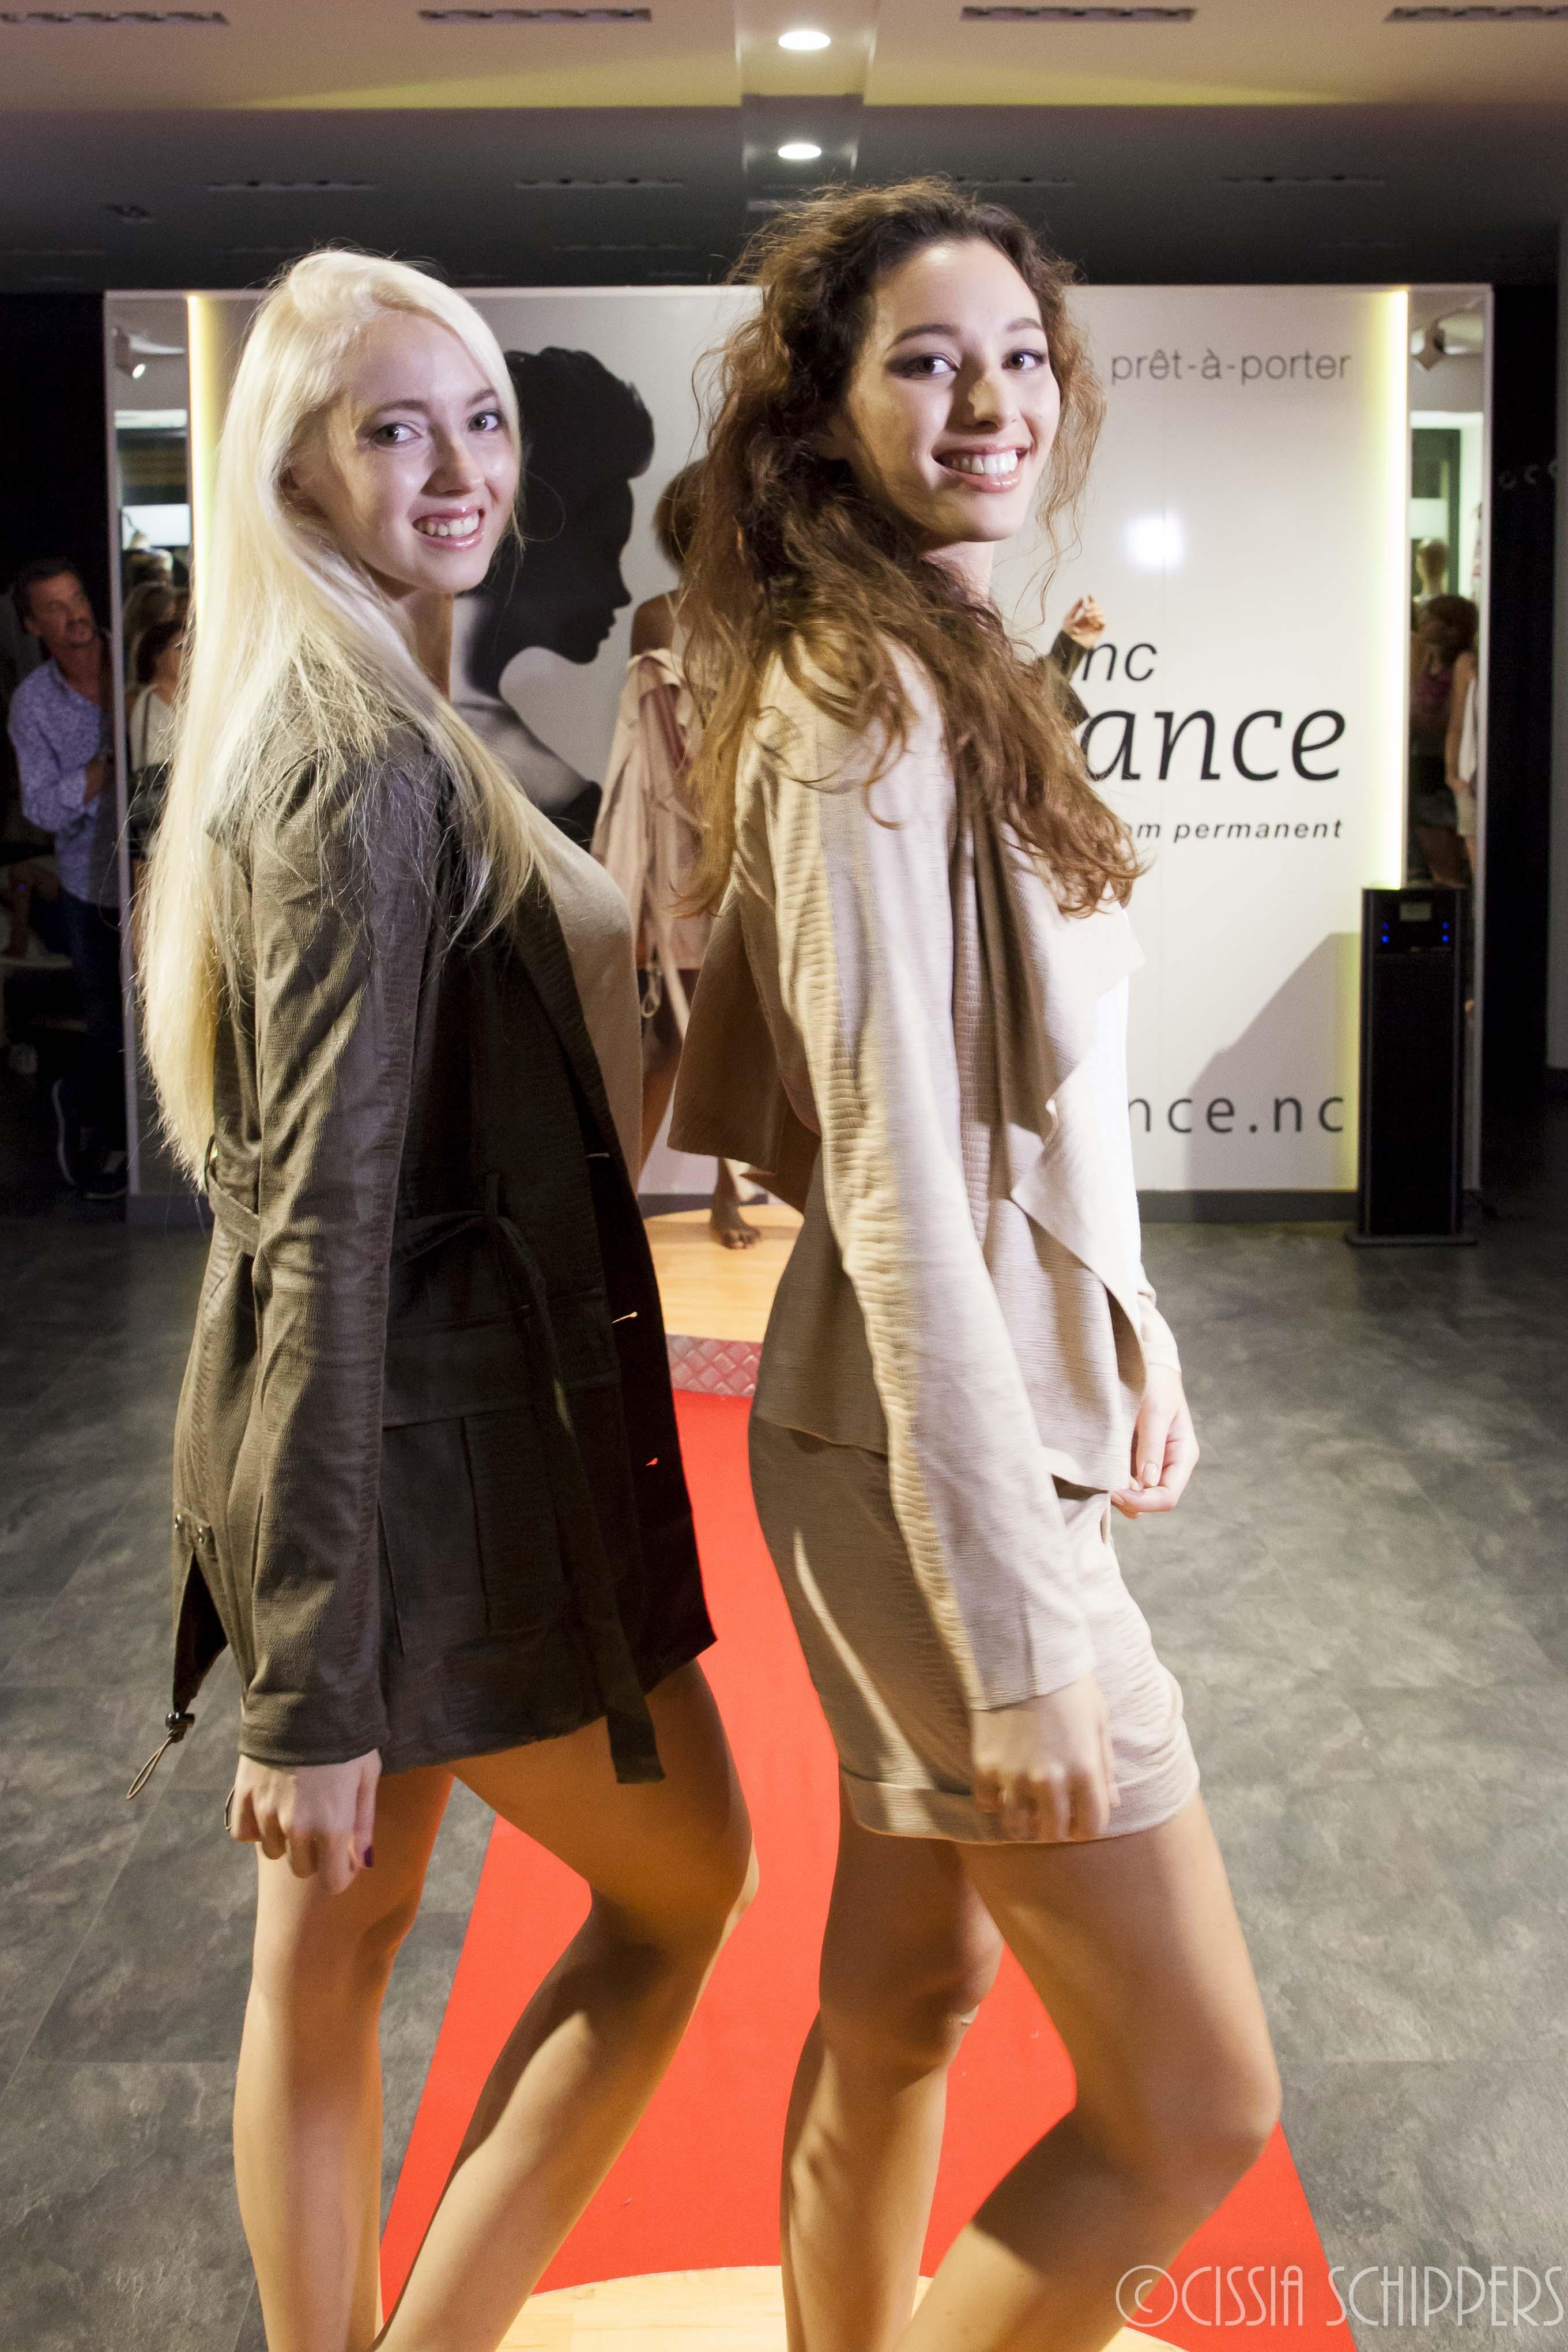 Tendance NC 2017 by Cissia Schippers photographe-8404